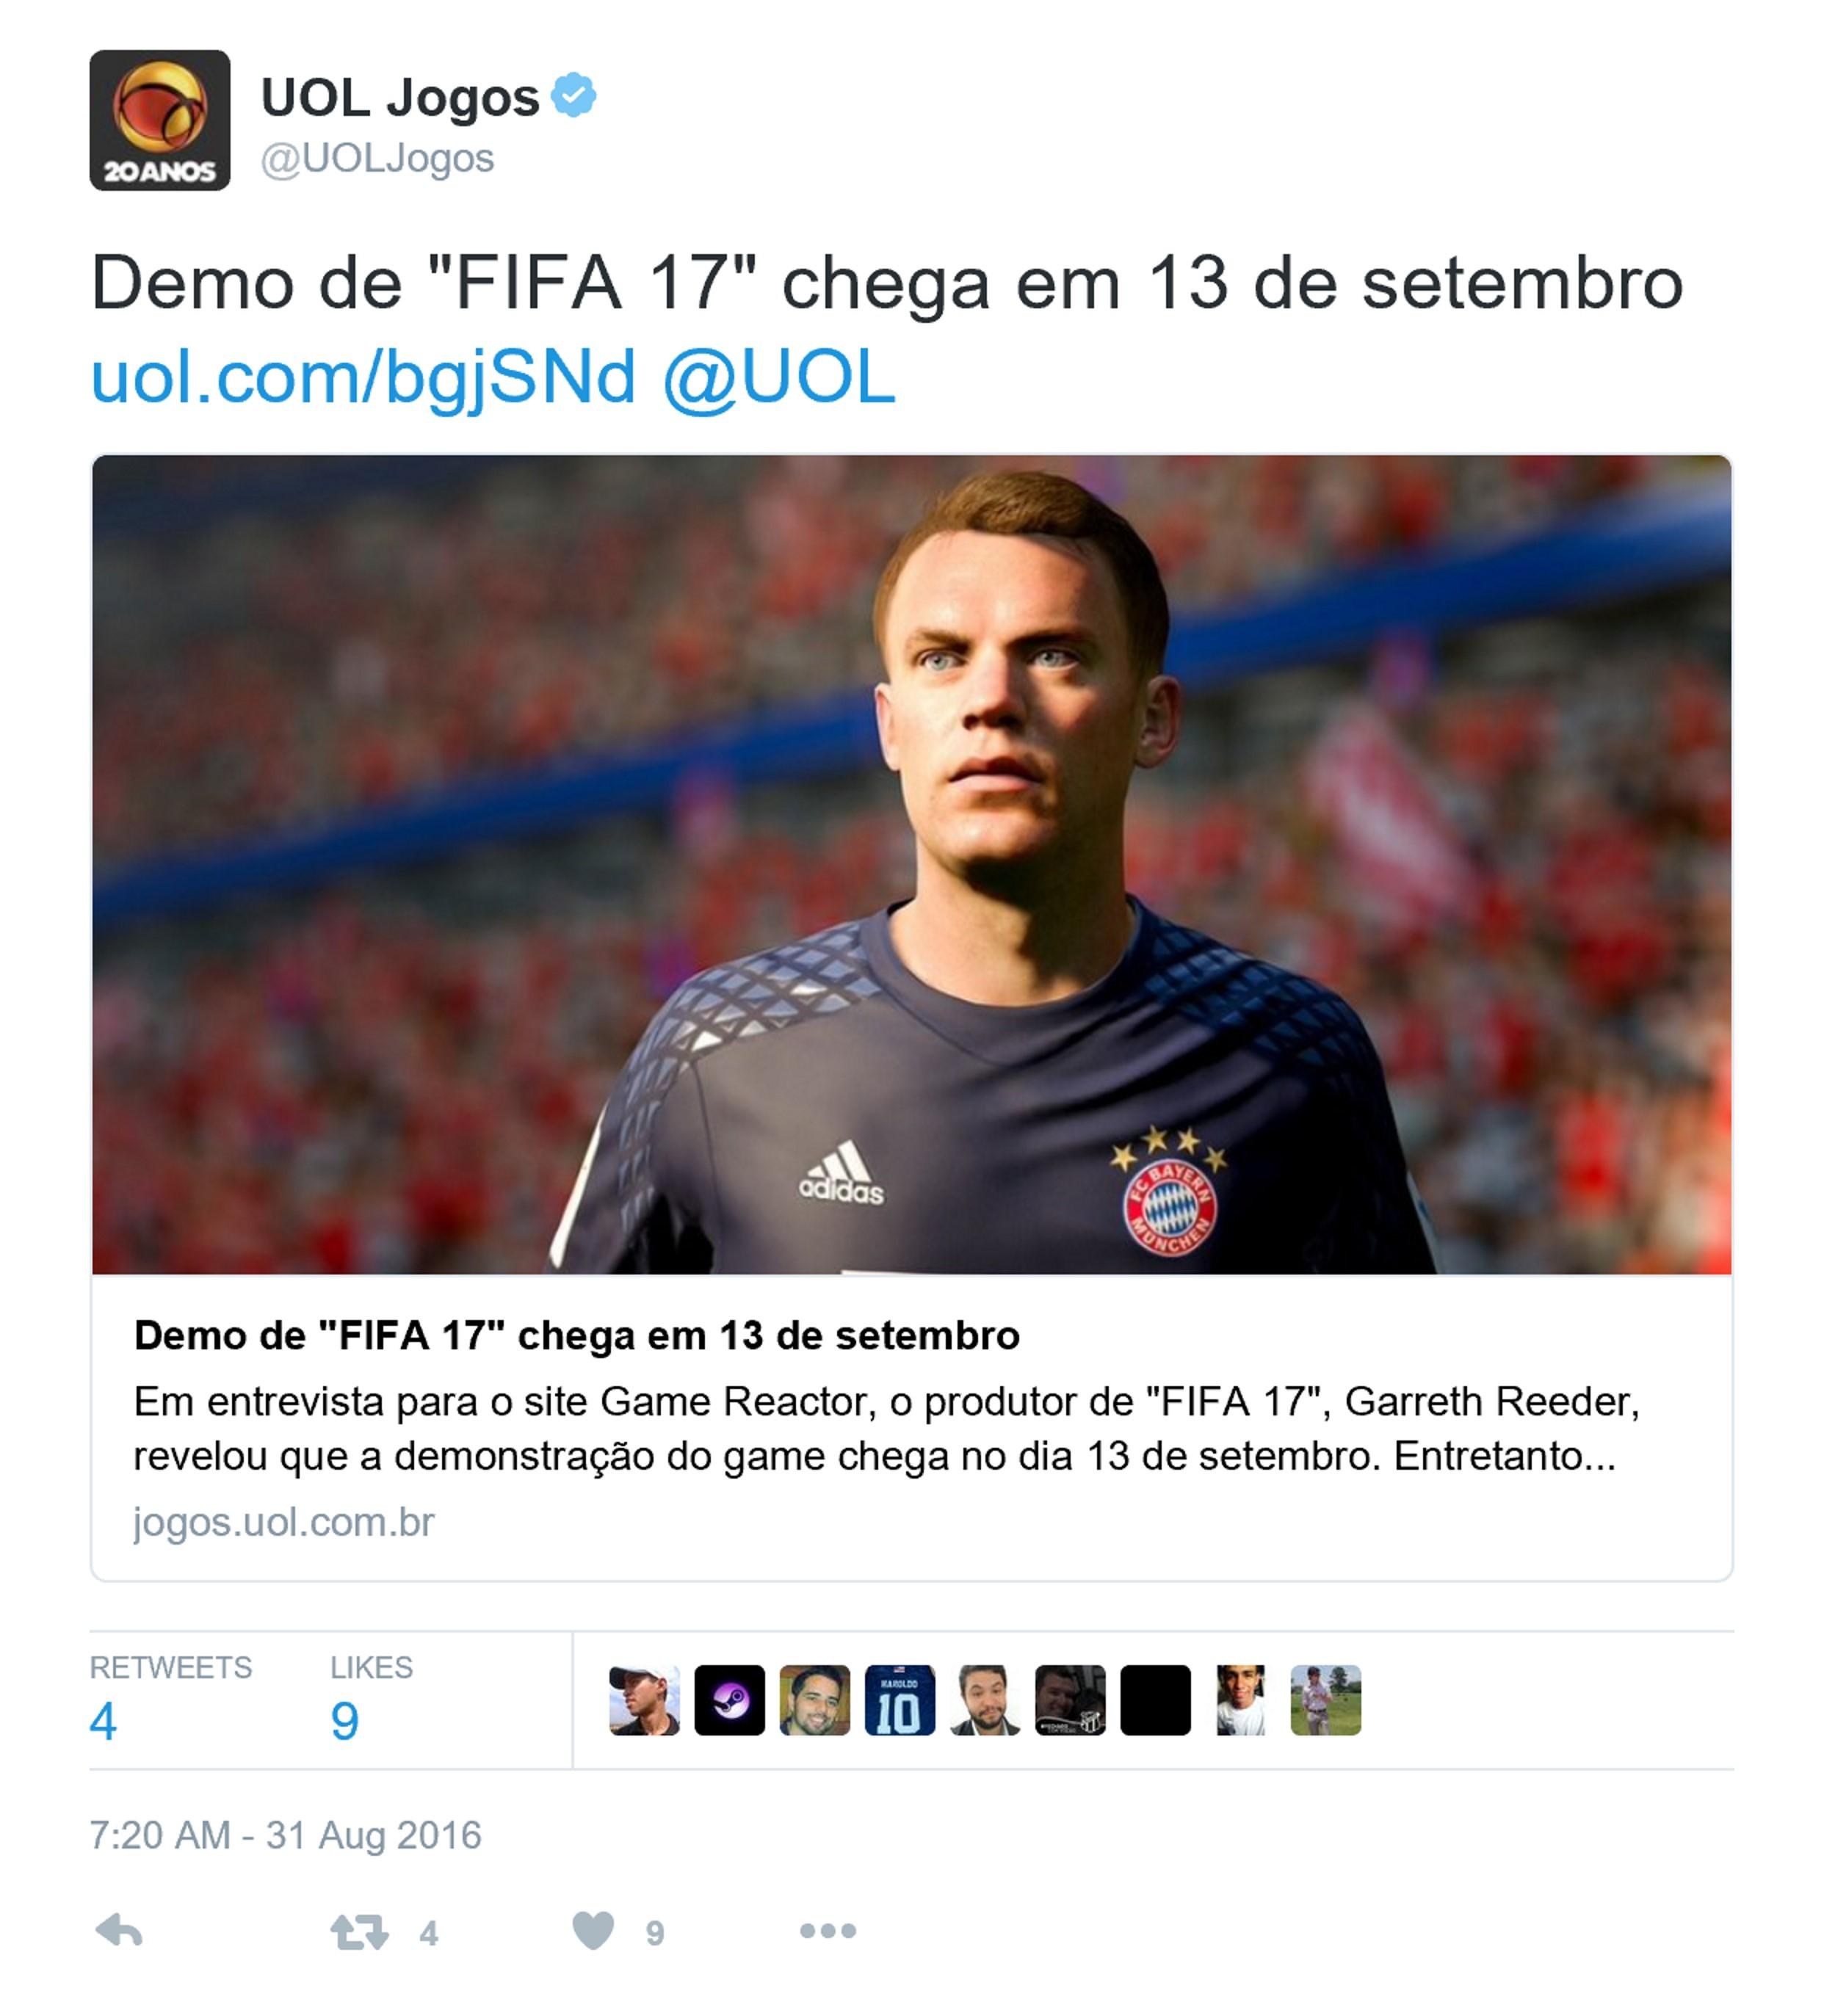 《FIFA 17》试玩版Demo9月上线